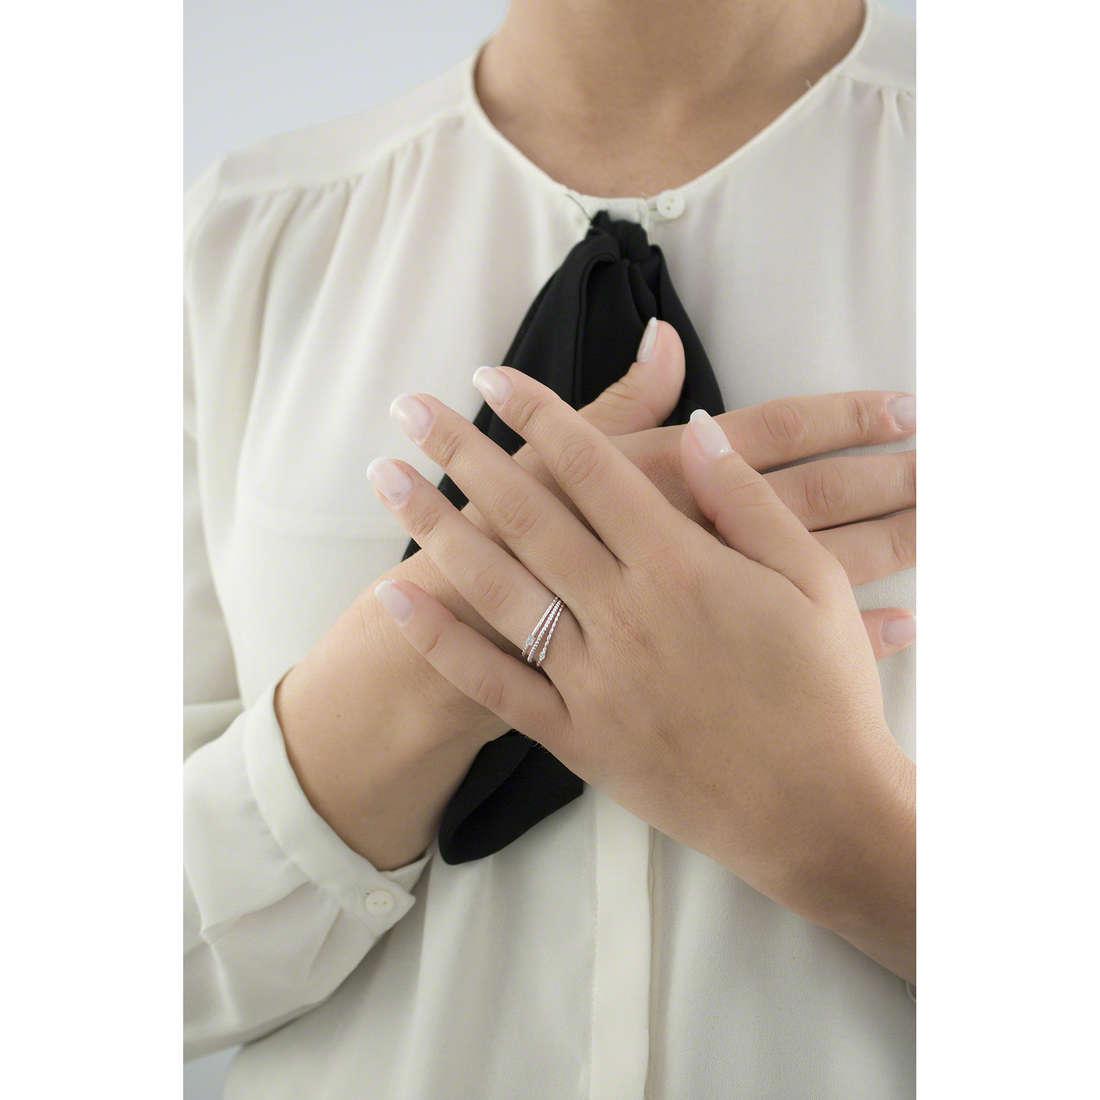 Morellato rings 1930 Michelle Hunziker woman SAHA14014 indosso